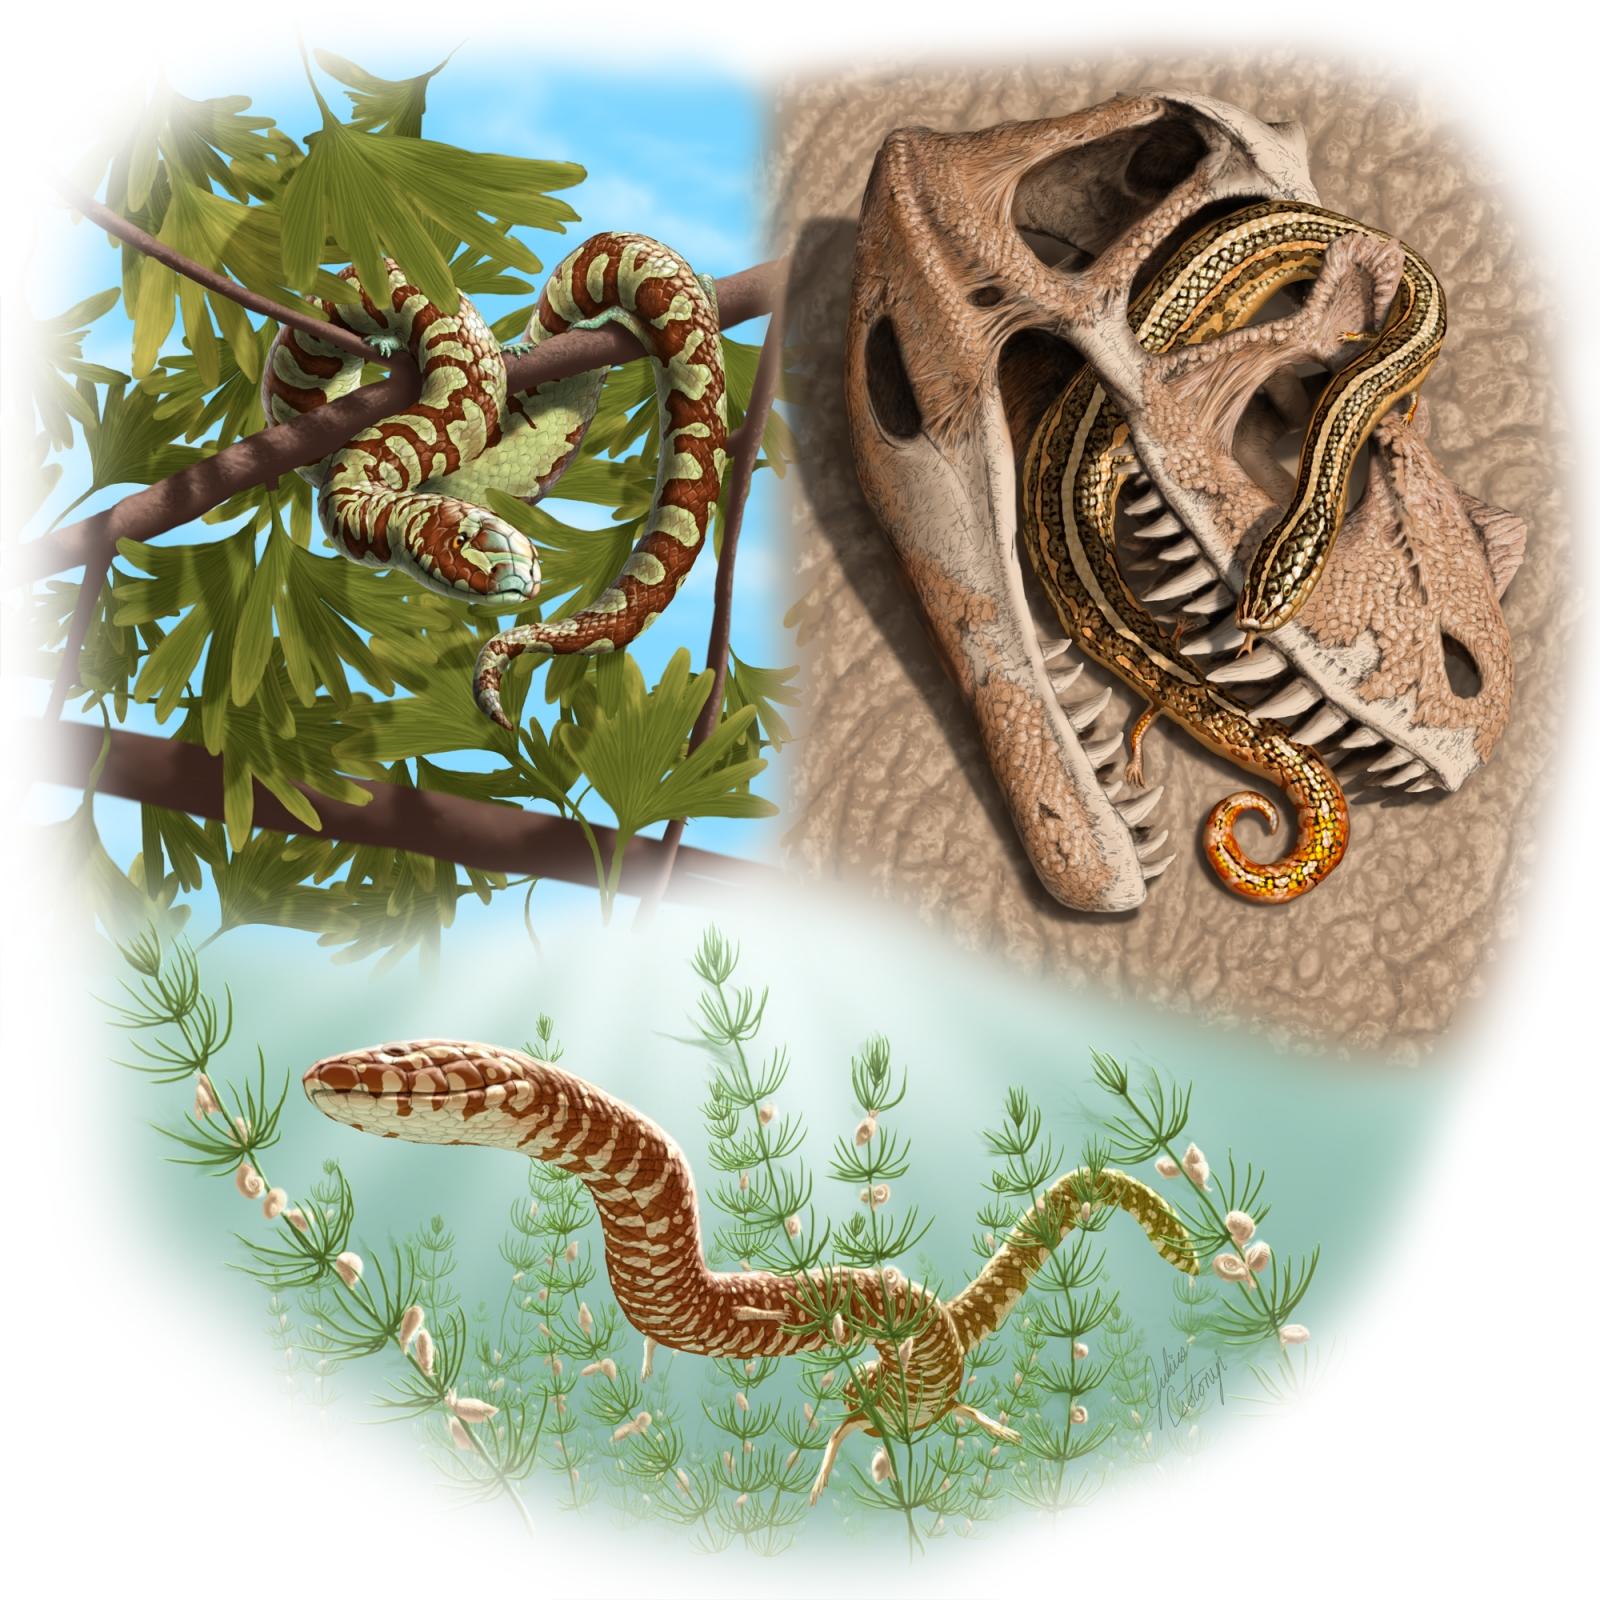 world's oldest snakes